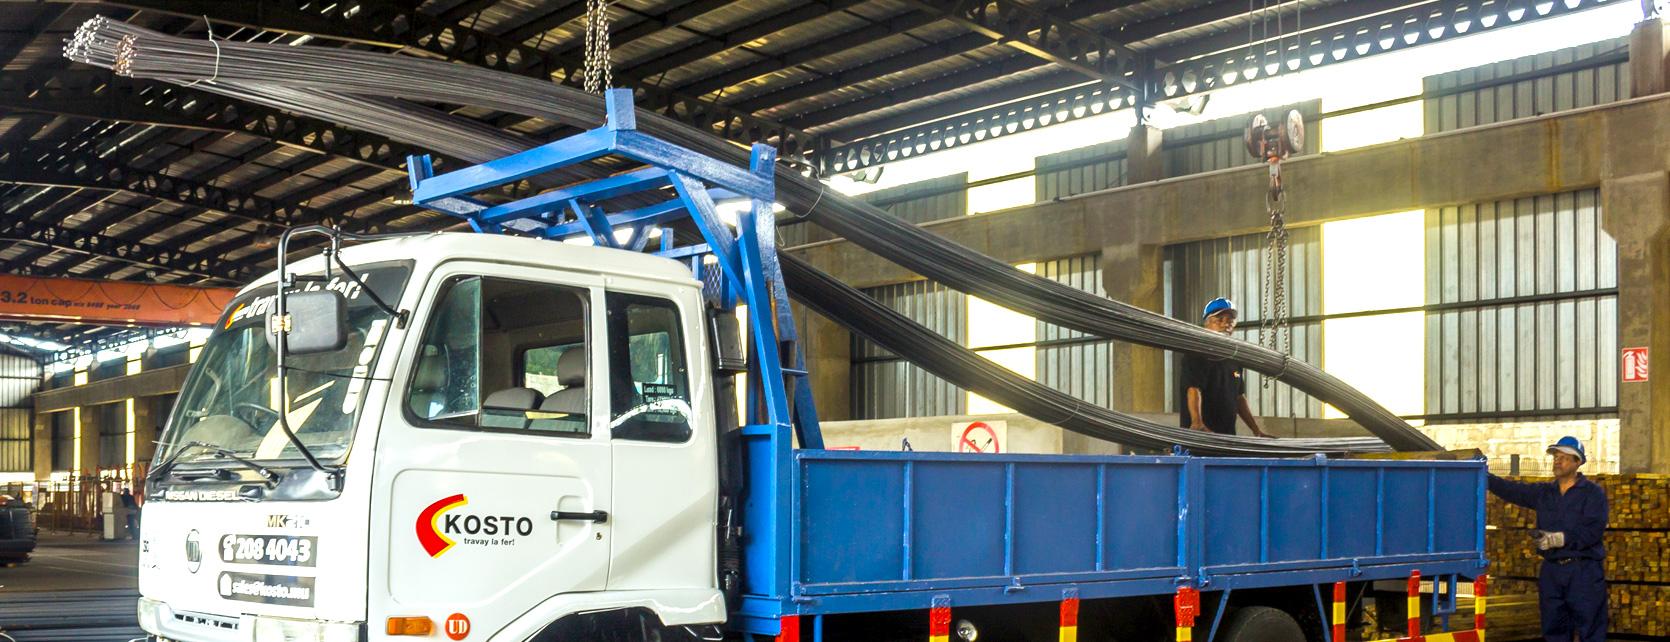 Kosto Delivery Truck